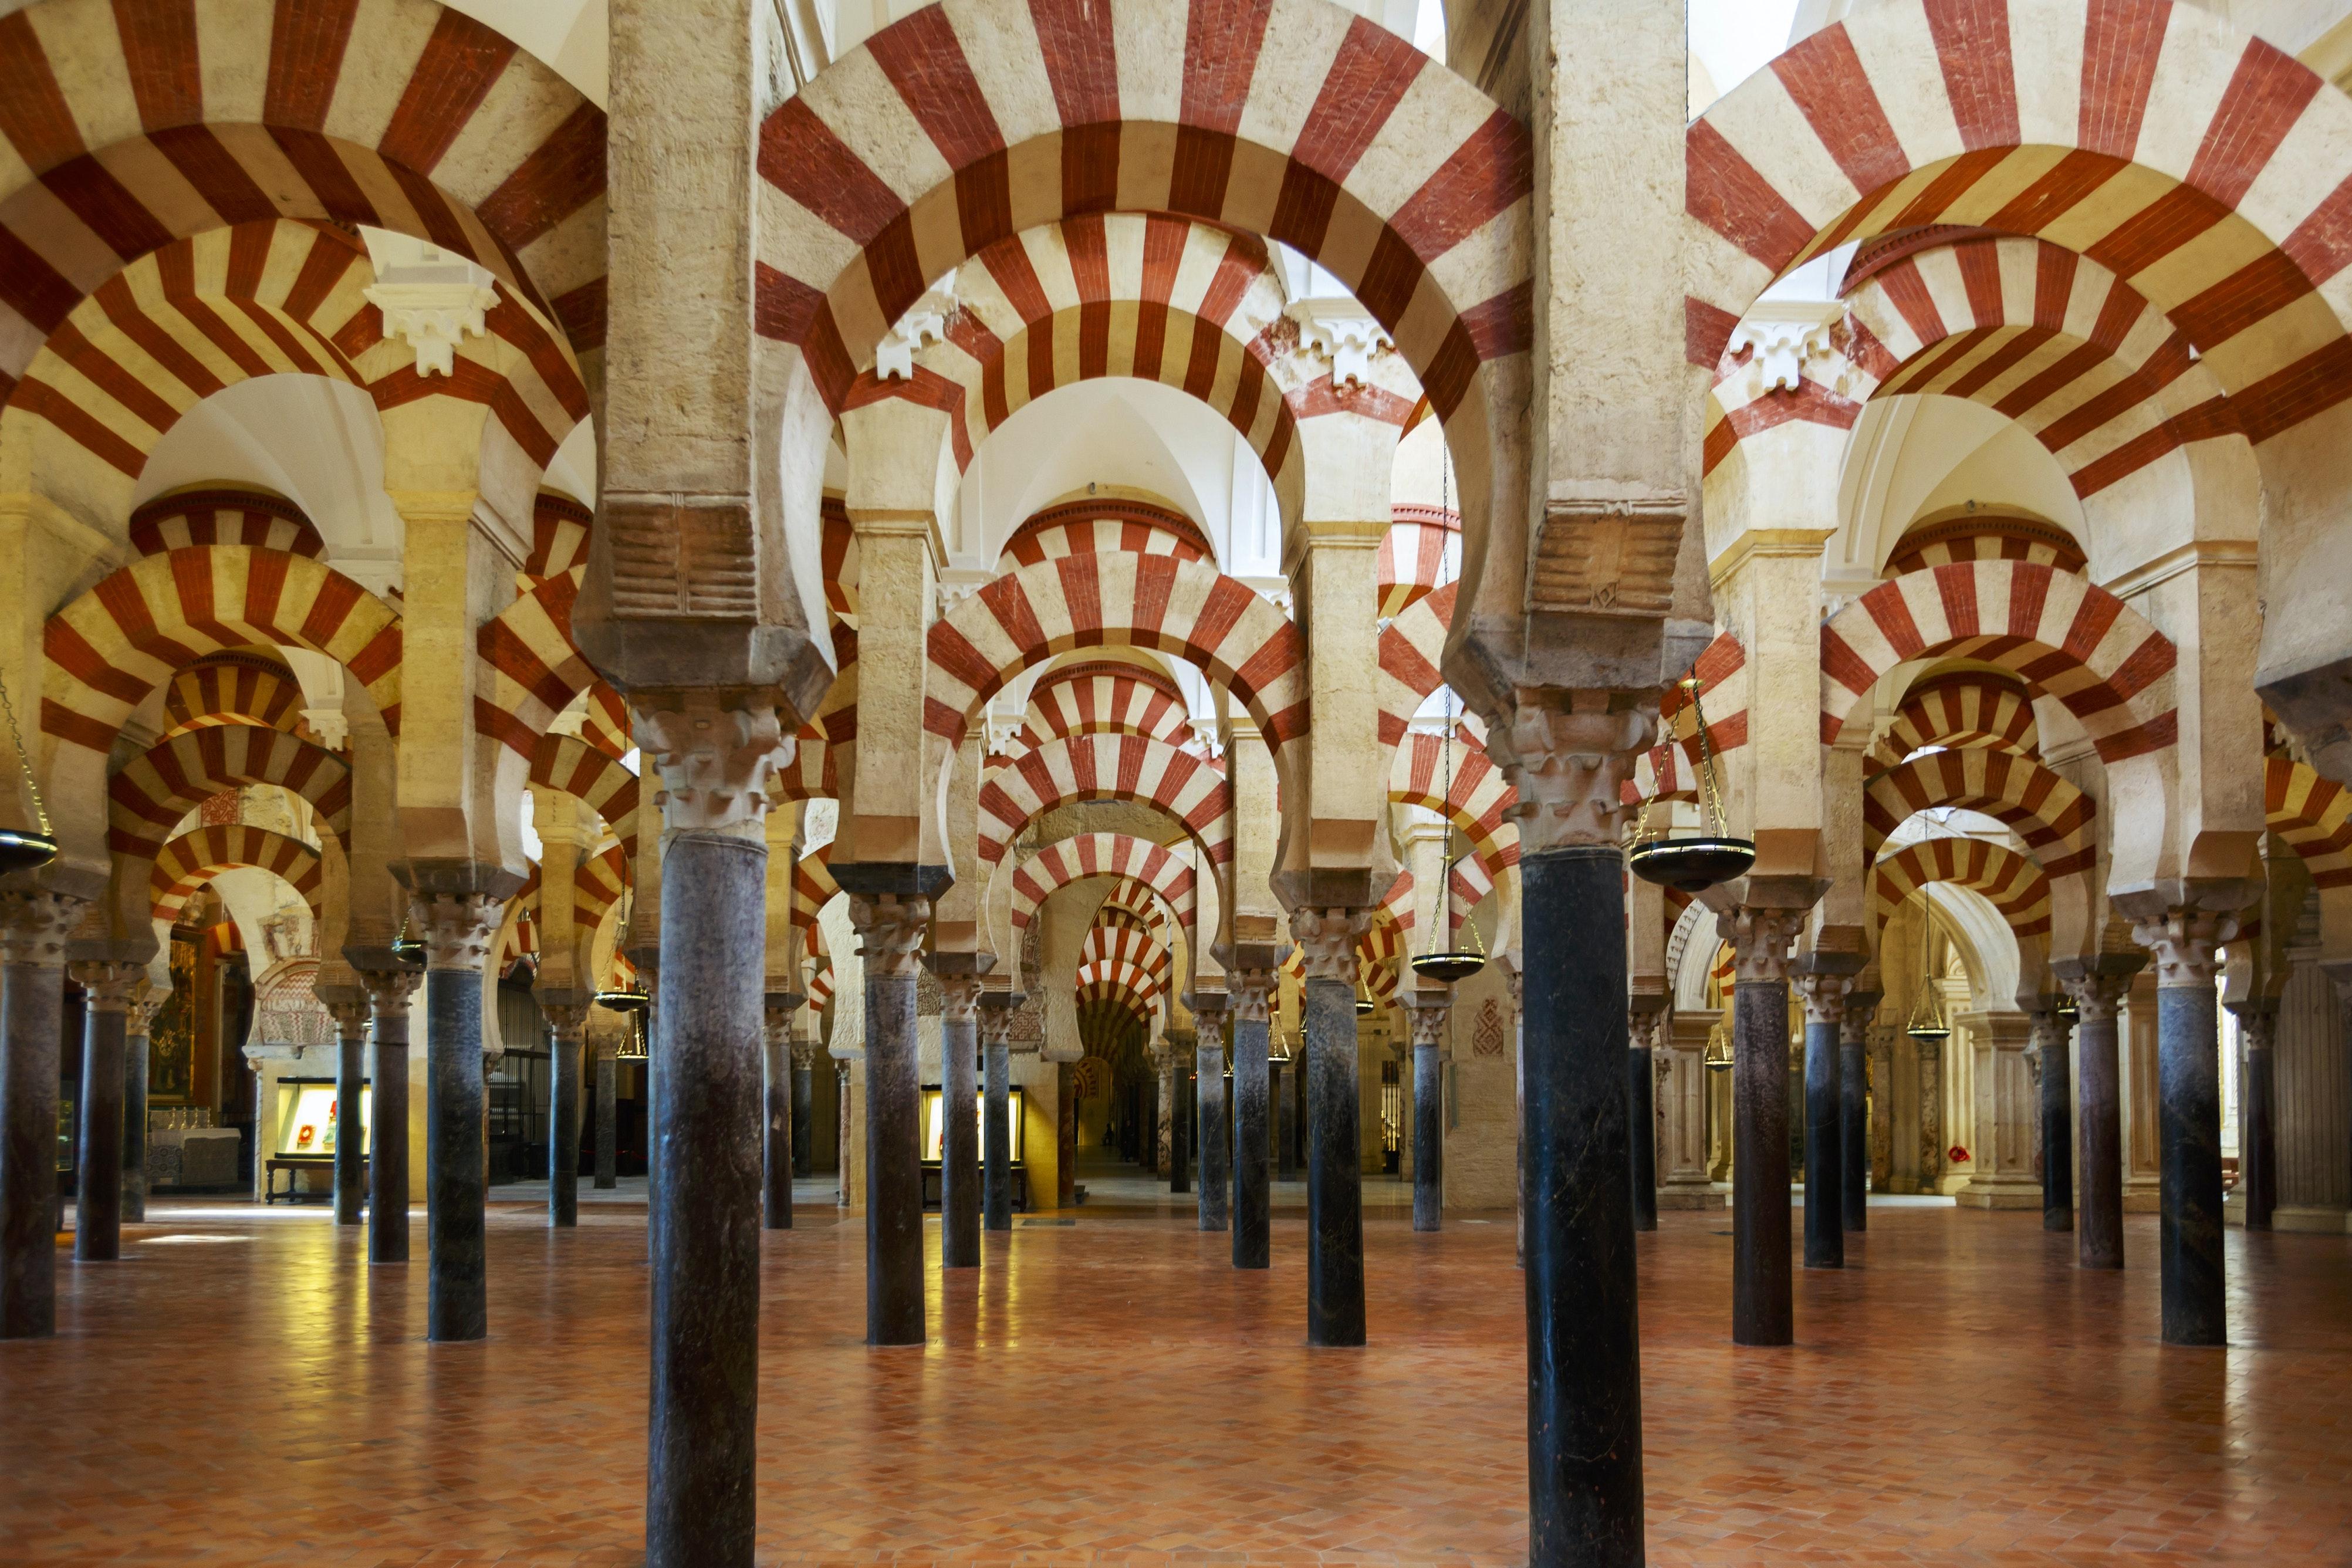 Mezquita in Córdoba, Spain - Lonely Planet